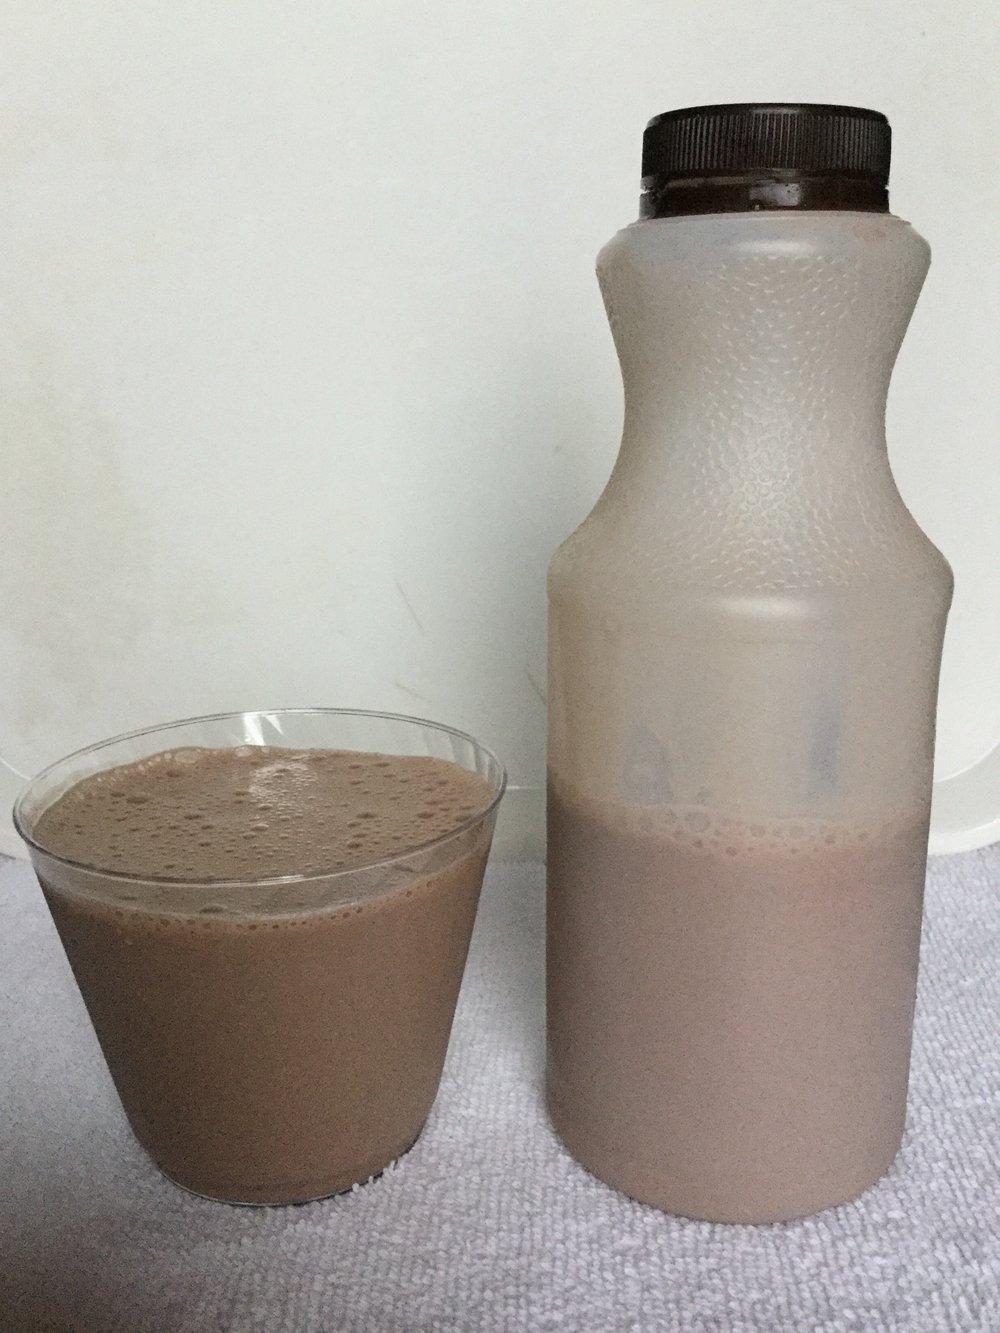 Manning Farm Dairy Chocolate Milk Cup